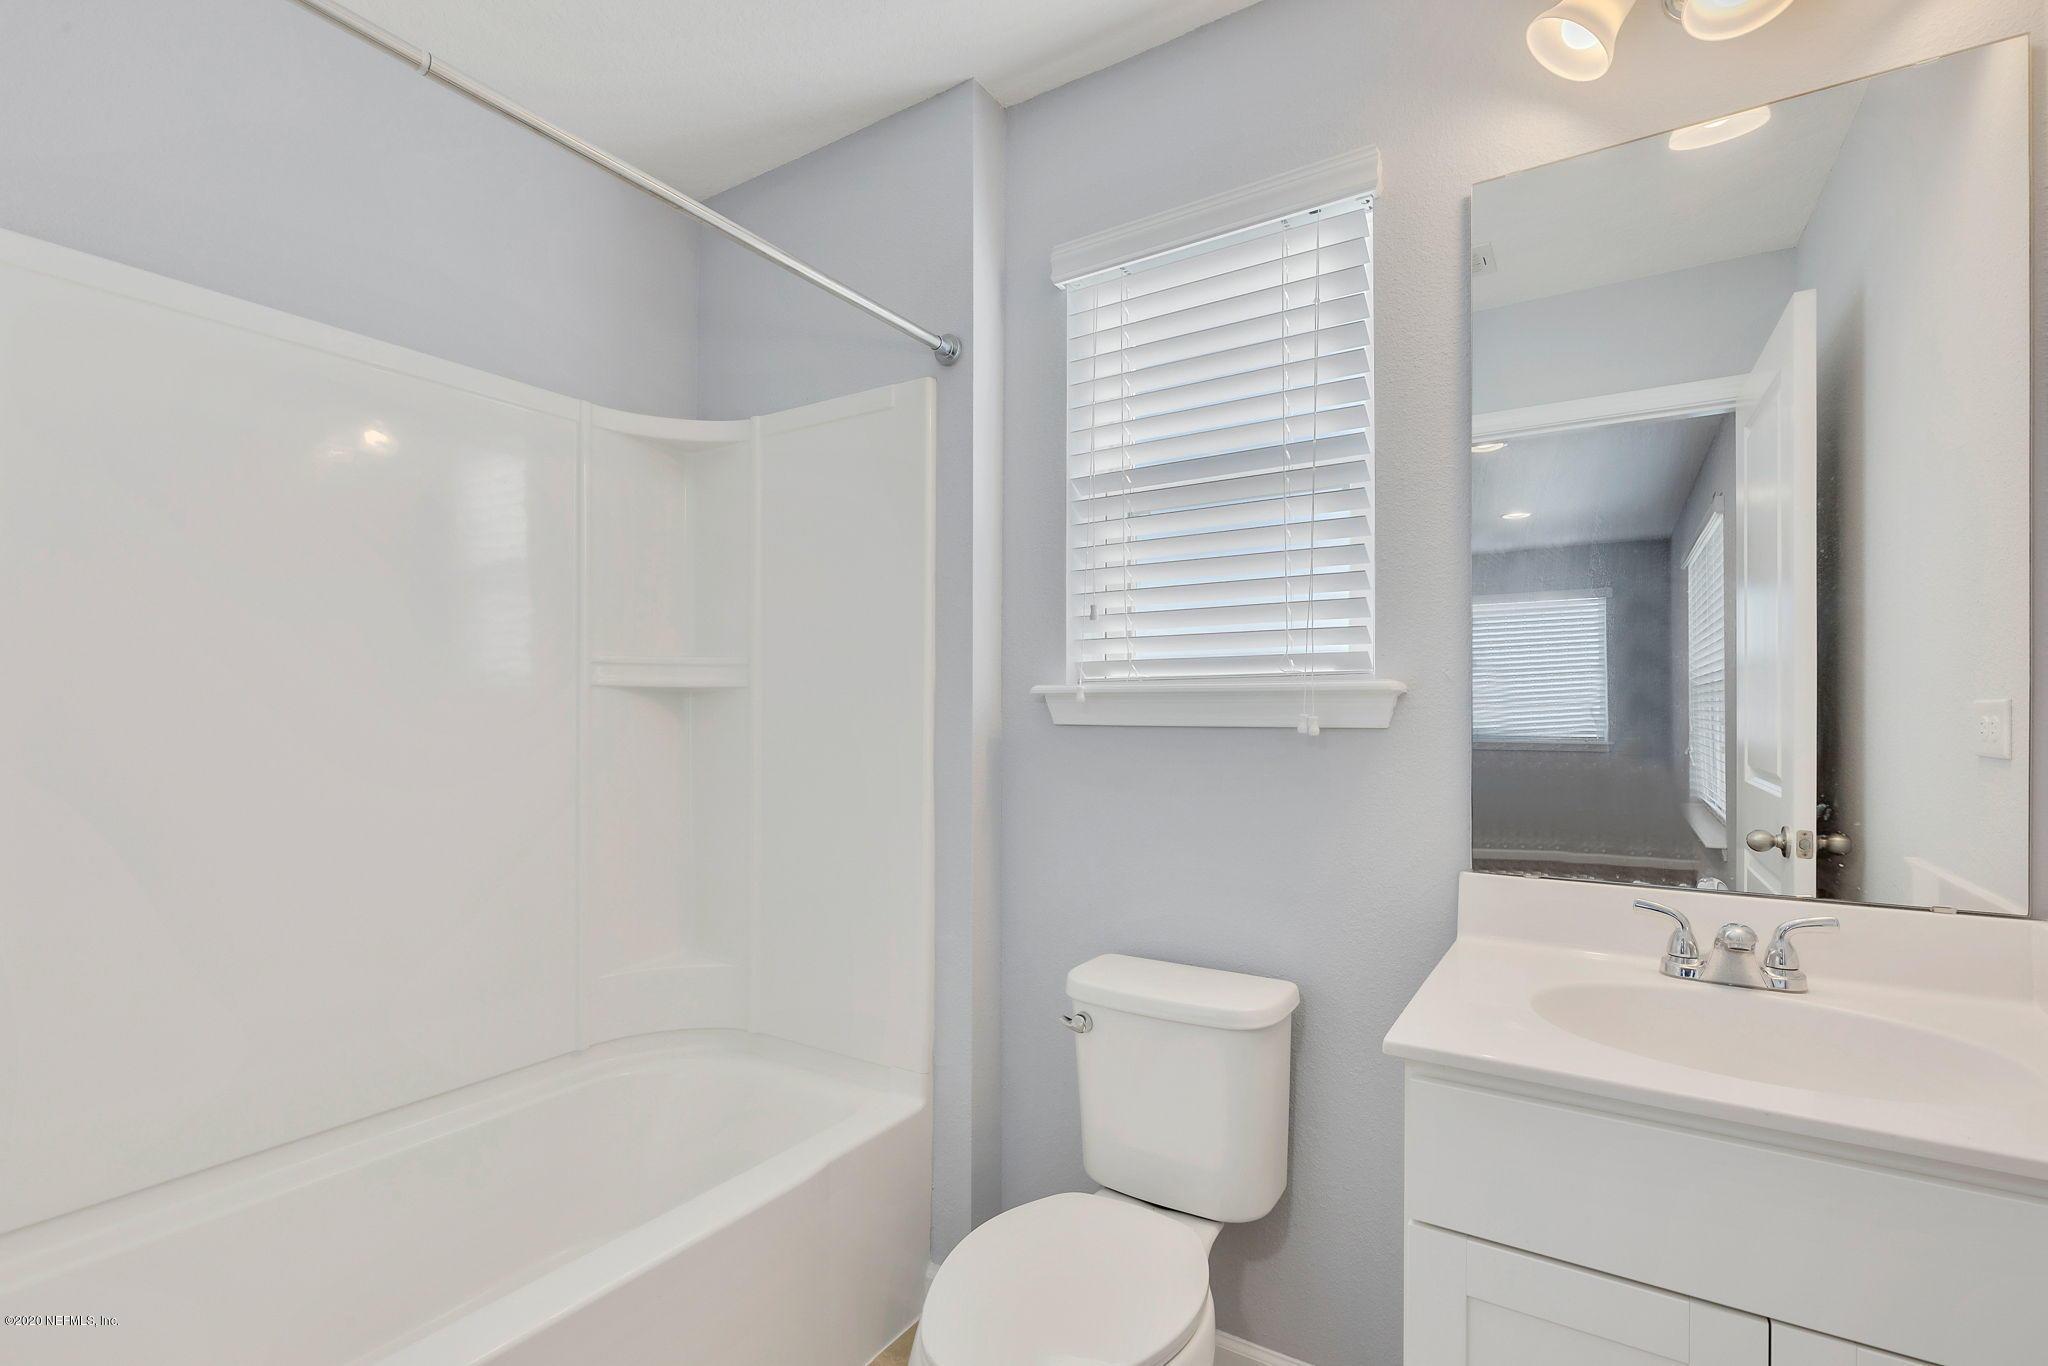 95251 Snapdragon, FERNANDINA BEACH, FLORIDA 32034, 5 Bedrooms Bedrooms, ,4 BathroomsBathrooms,Residential,For sale,Snapdragon,1080811